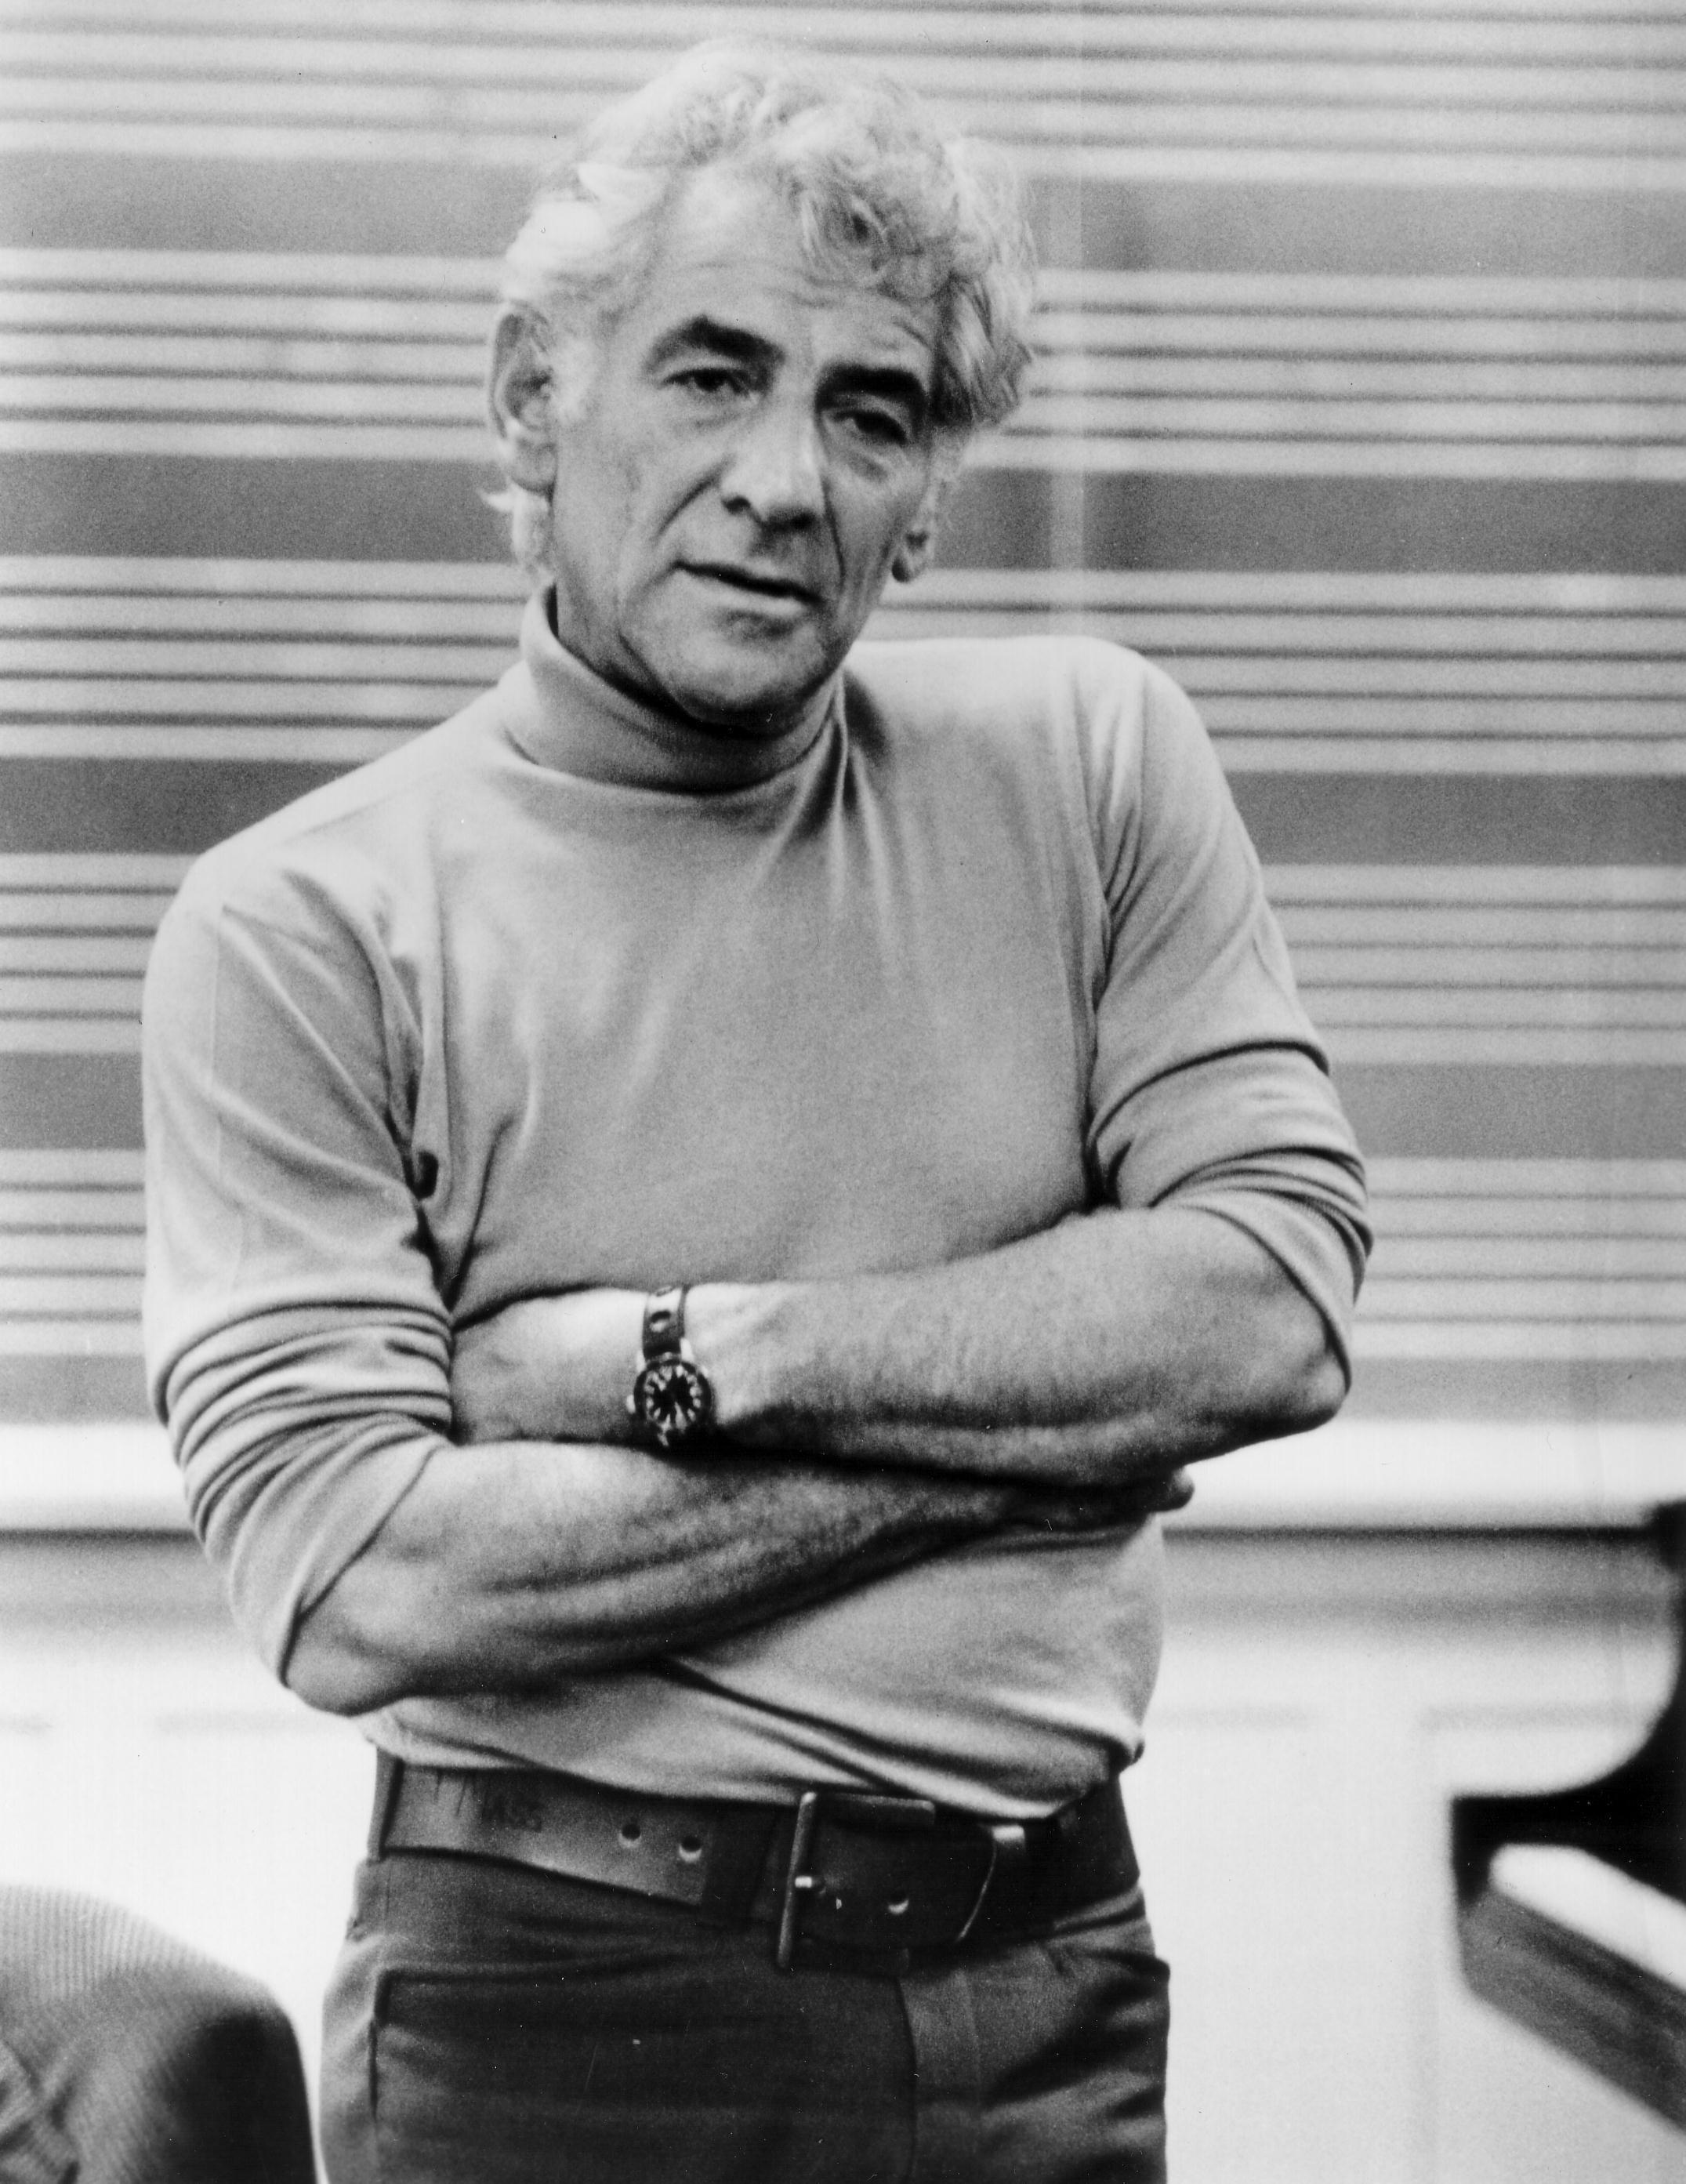 Leonard Bernstein - Hector Berlioz Symphonie Fantastique Op. 14